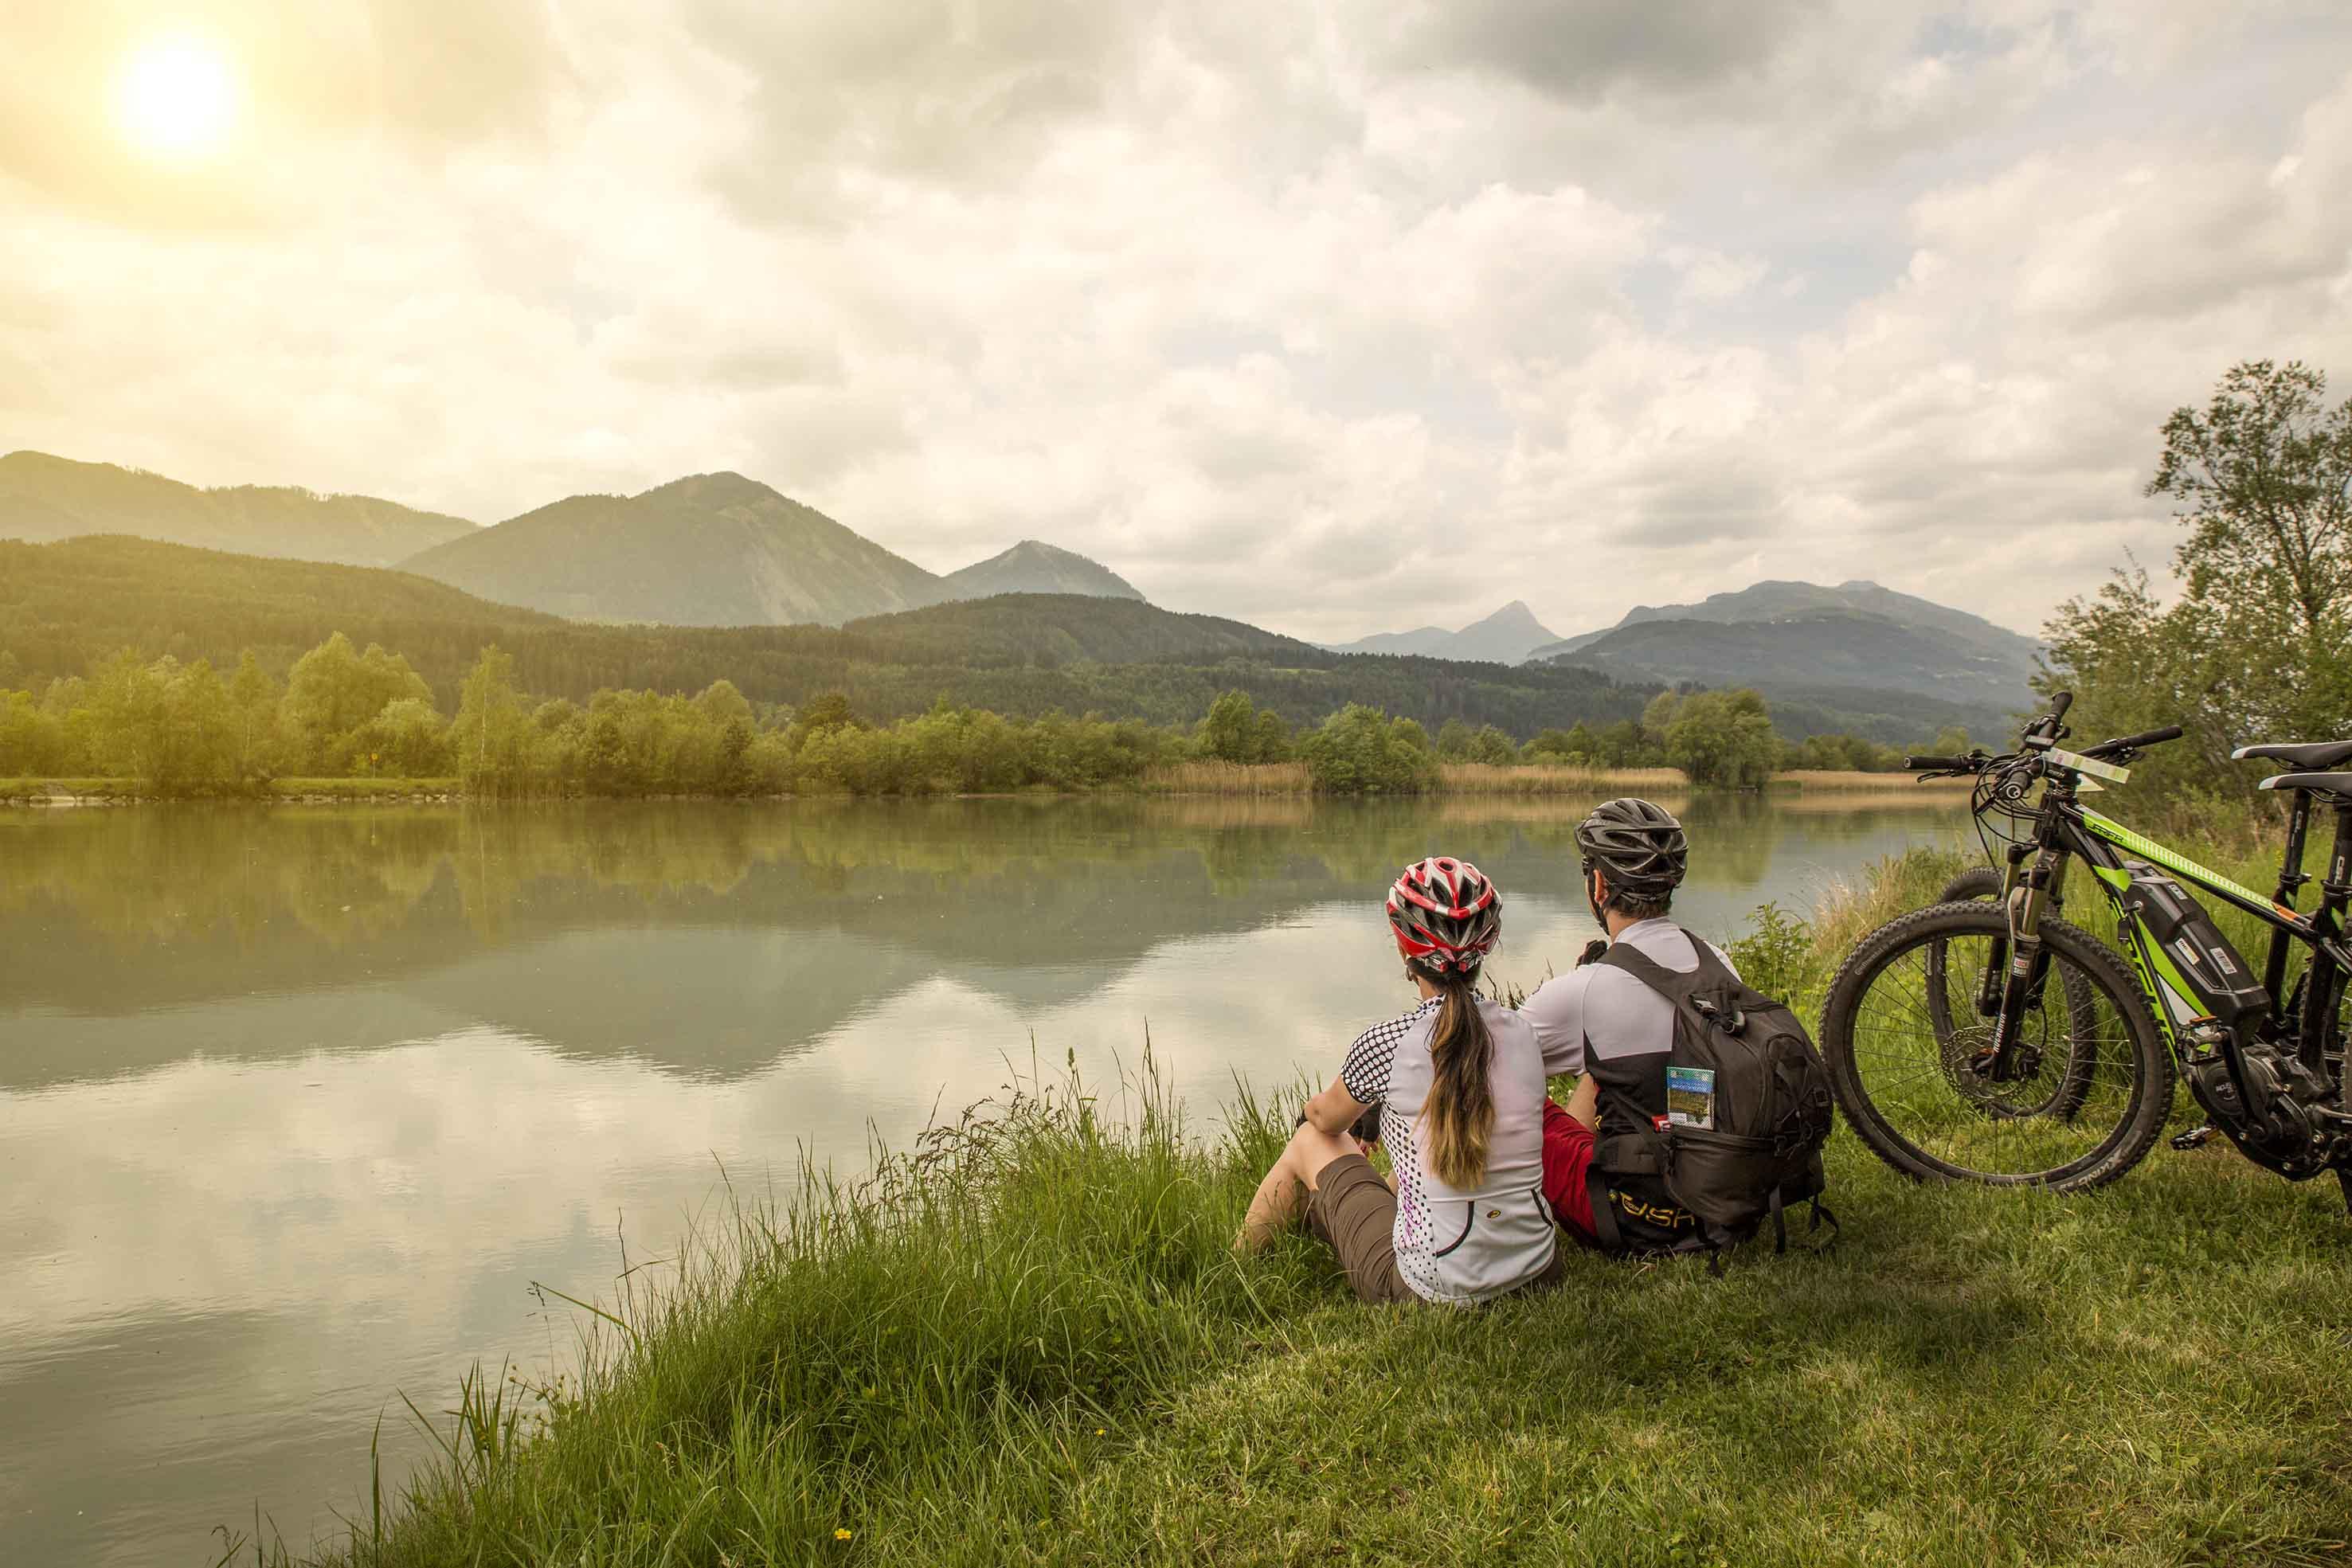 Copyright_Region-Villach-Tourismus_LIK-Fotoakadmie_-Martin_Jordan_Drauradweg_E-Bike